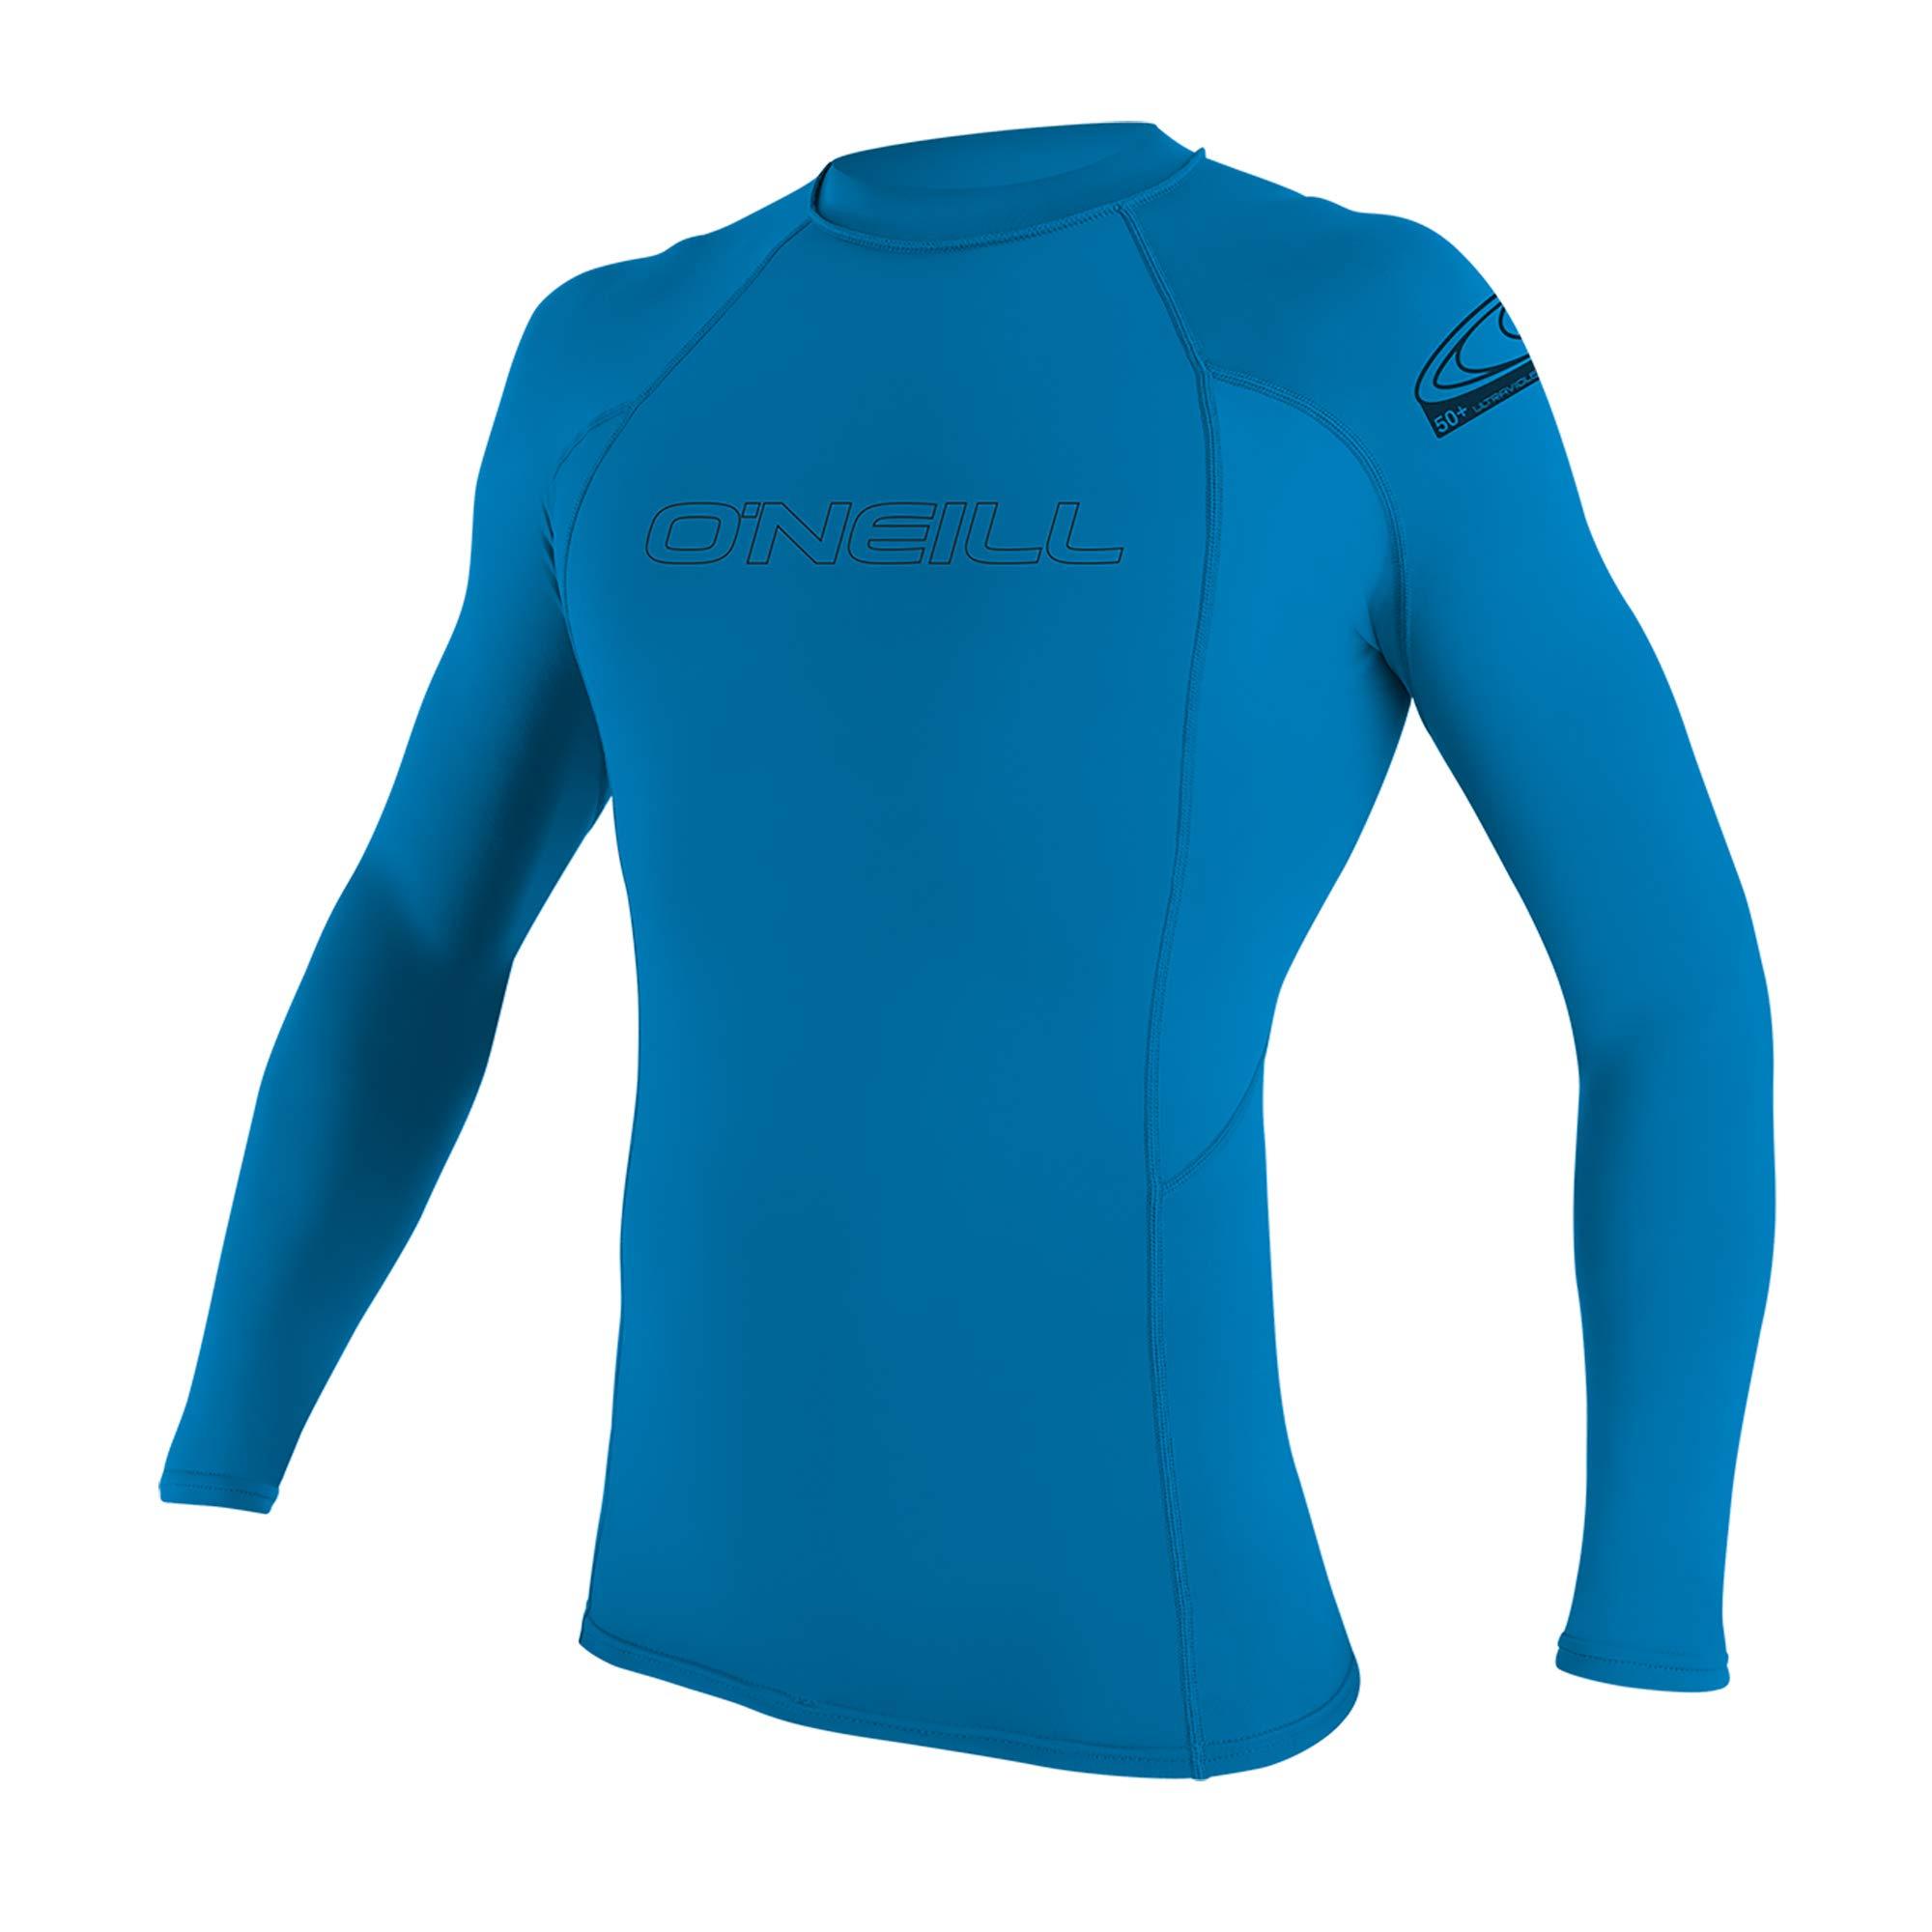 O'Neill Youth Basic Skins UPF 50+ Long Sleeve Rash Guard, Bright Blue, 4